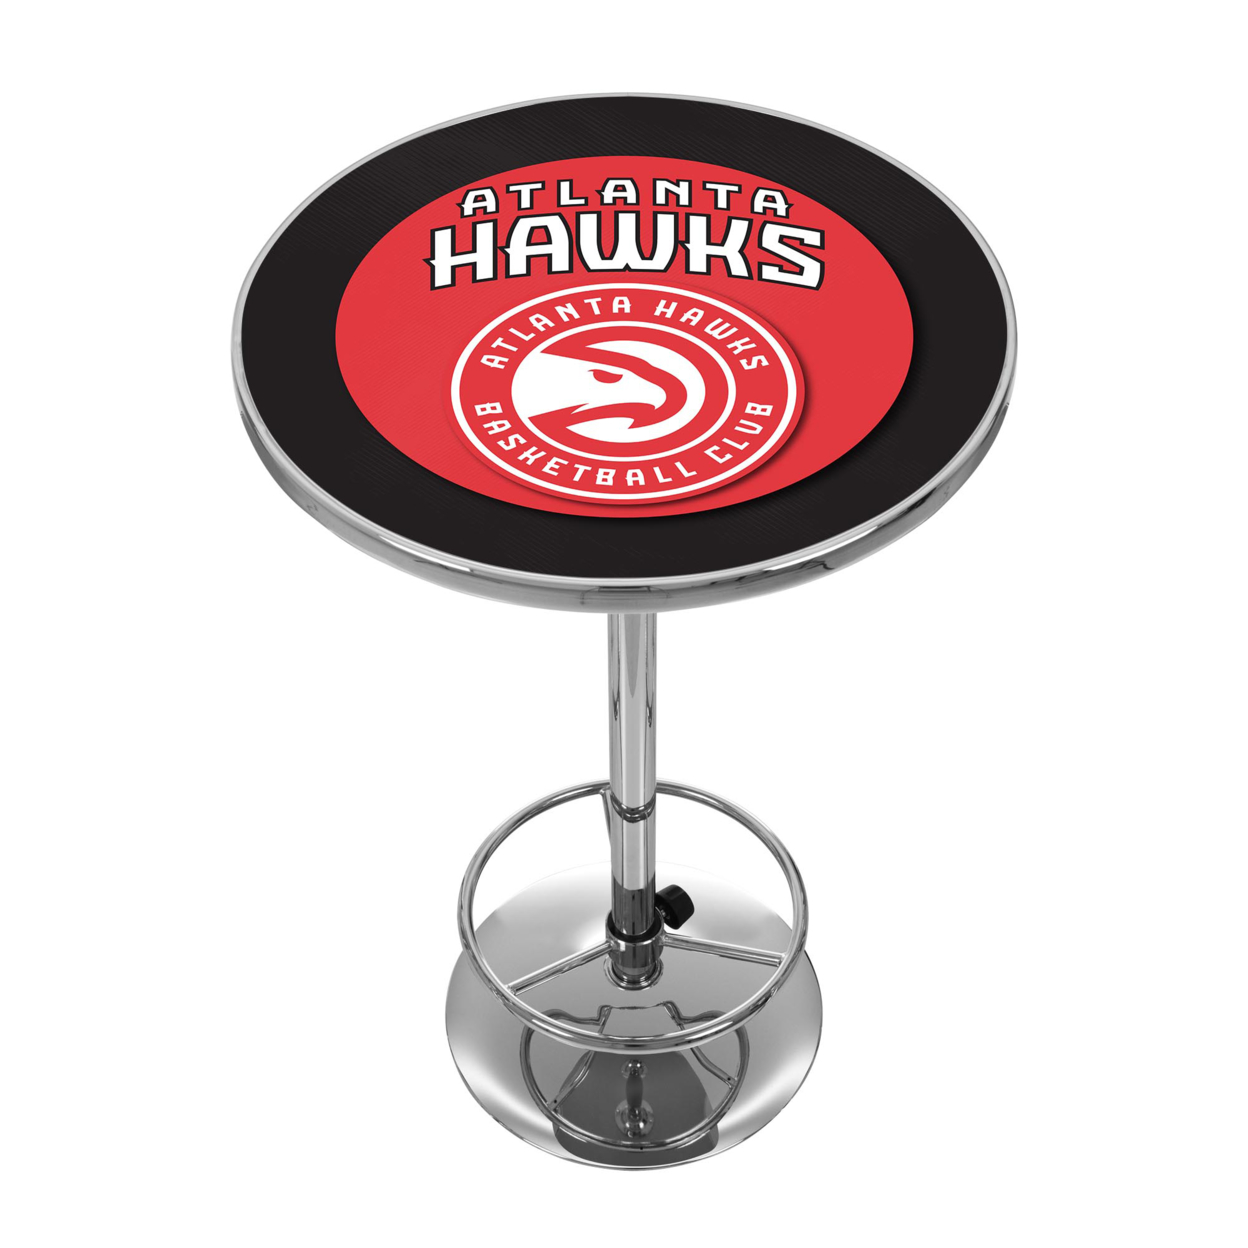 Atlanta Hawks NBA Chrome 42 Inch Pub Table